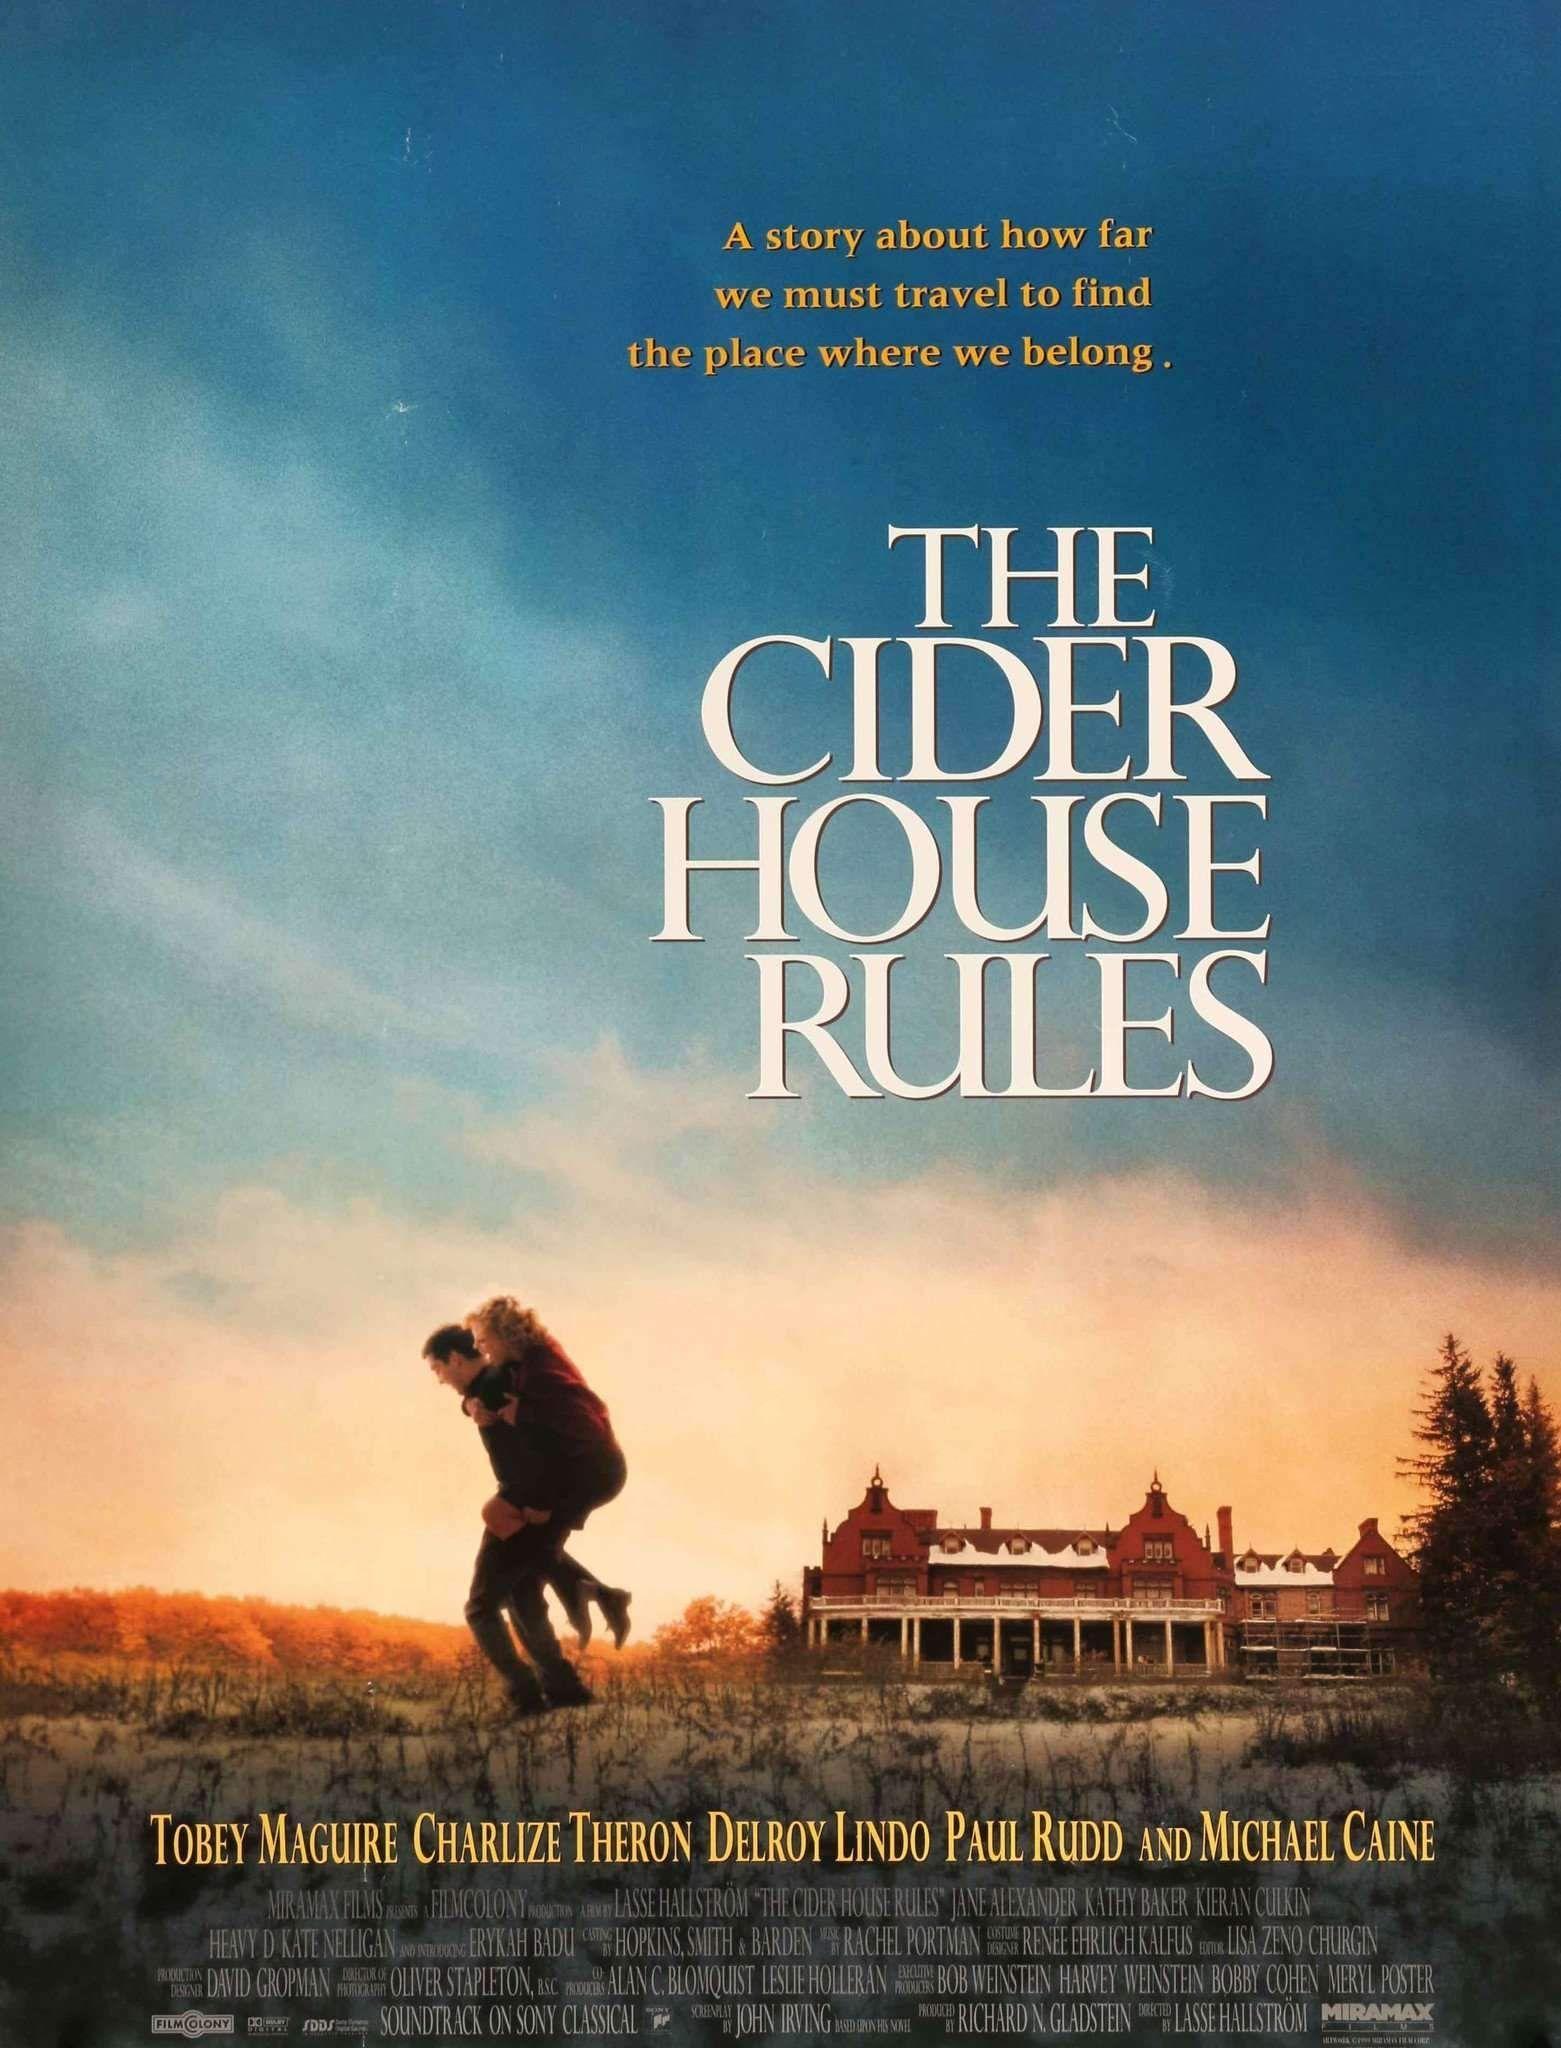 Cider house rules 1999 cider house rules cider house